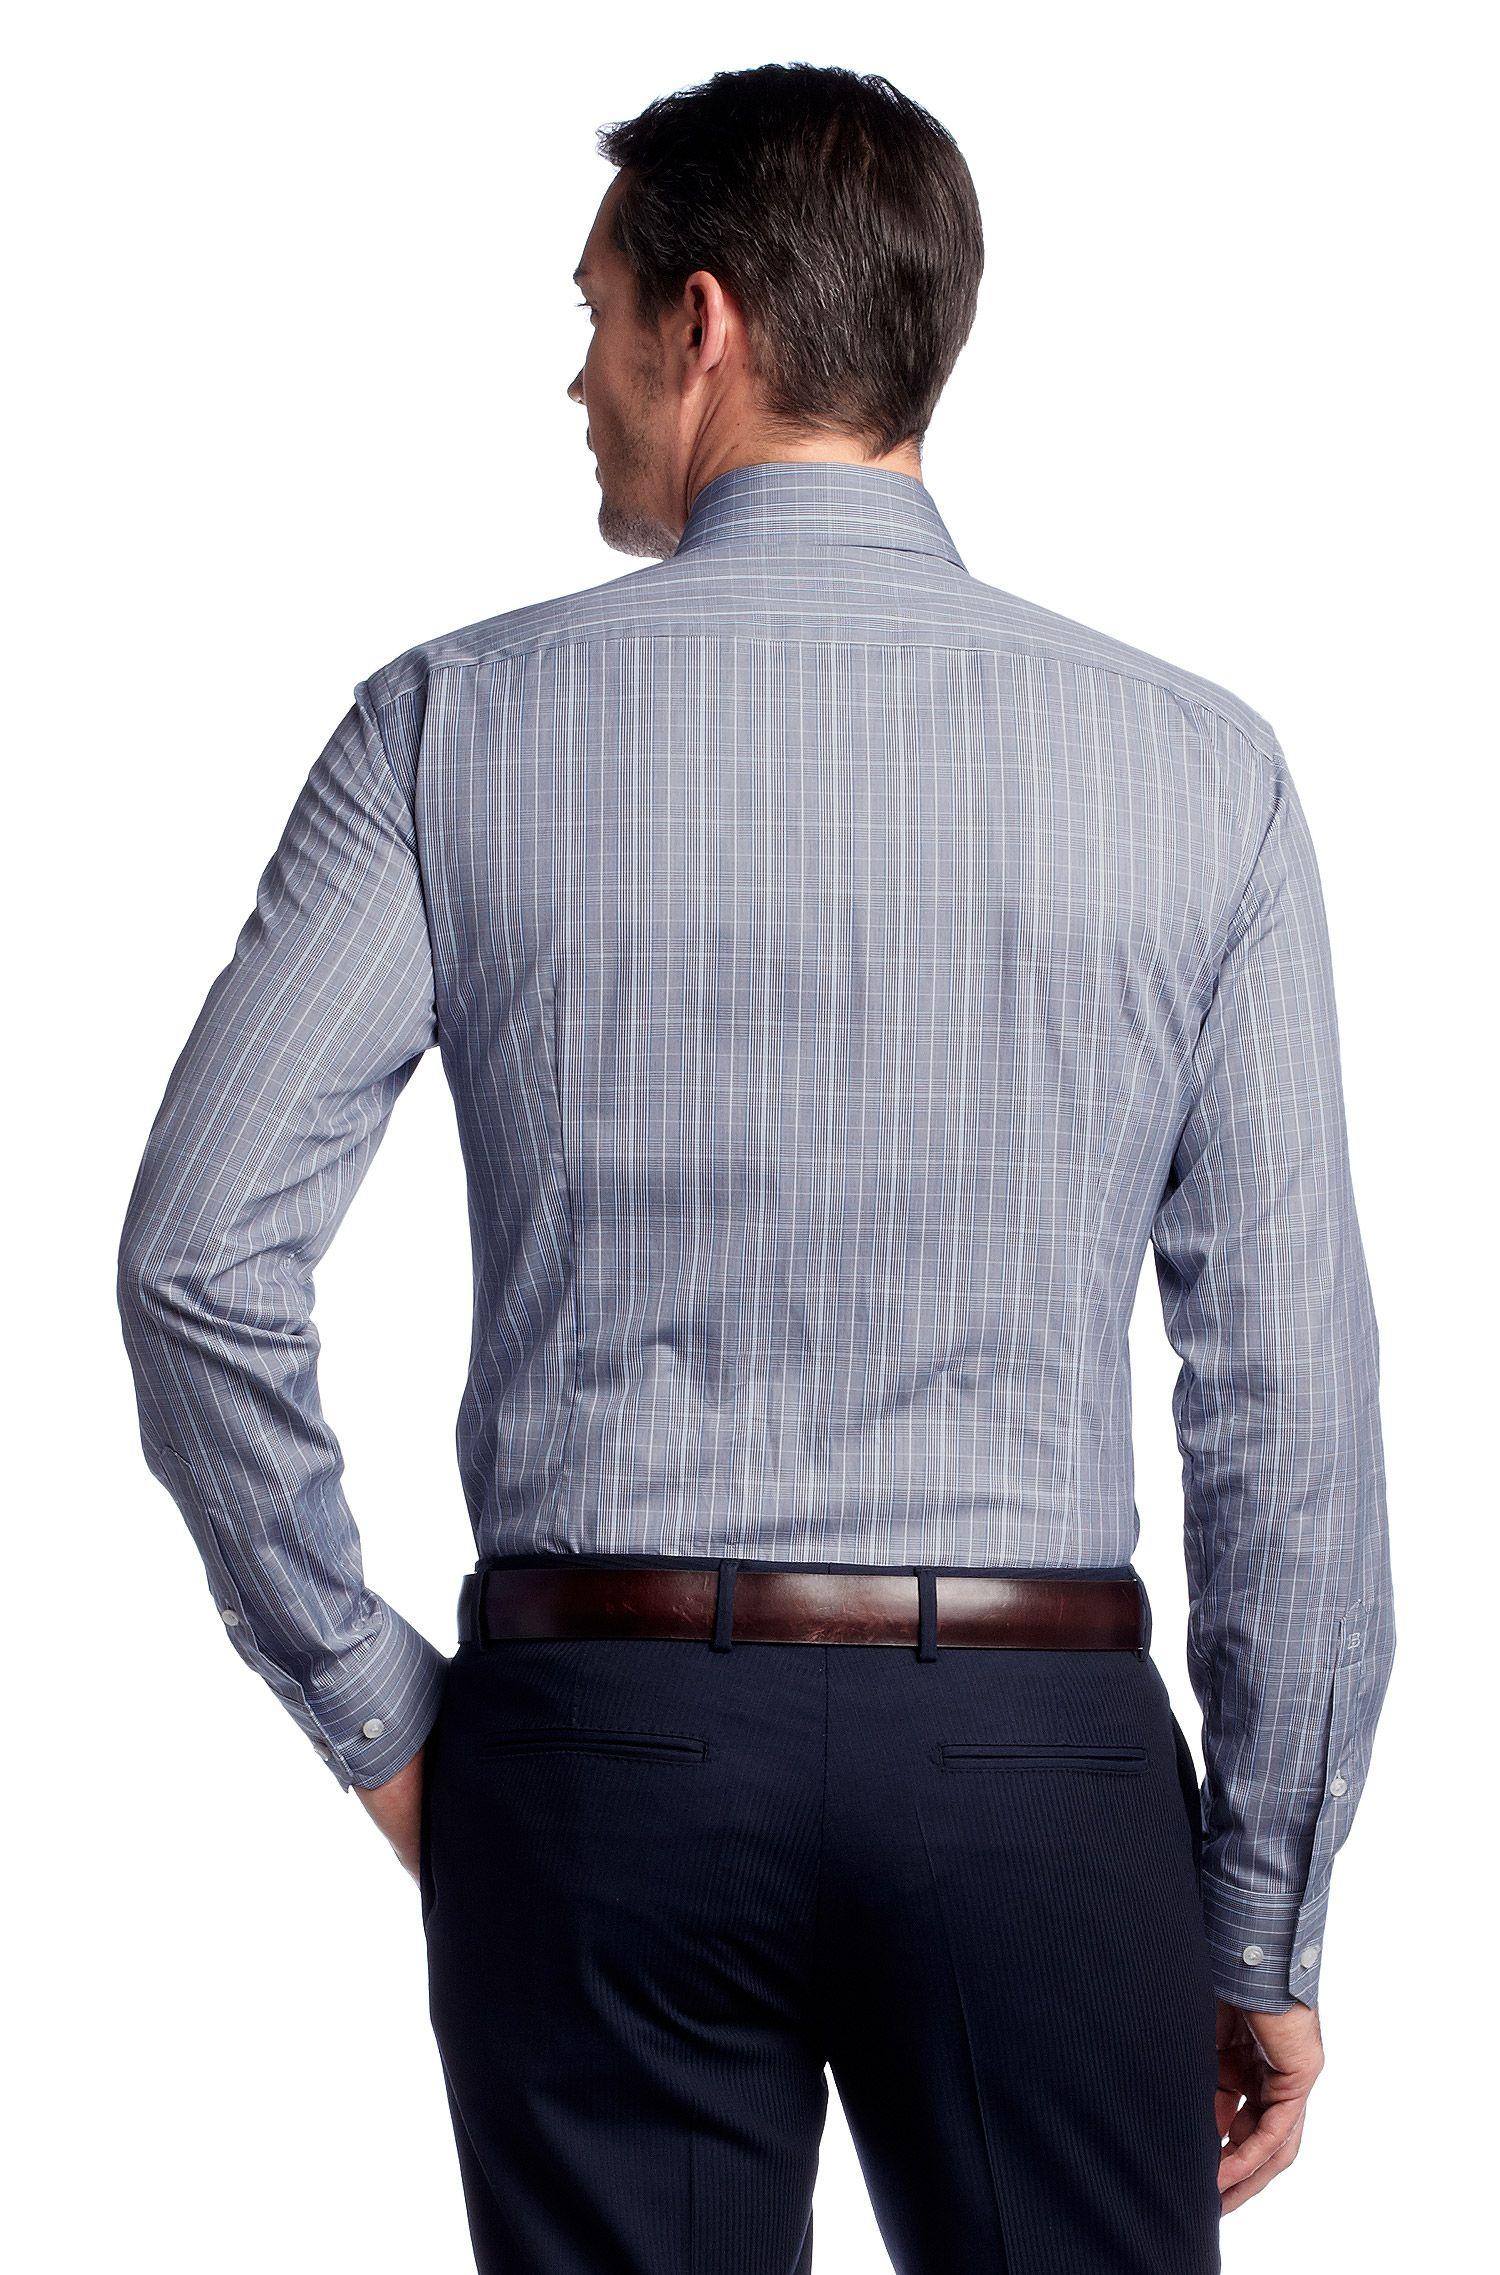 Business-overhemd ´Christo` met ruitdessin